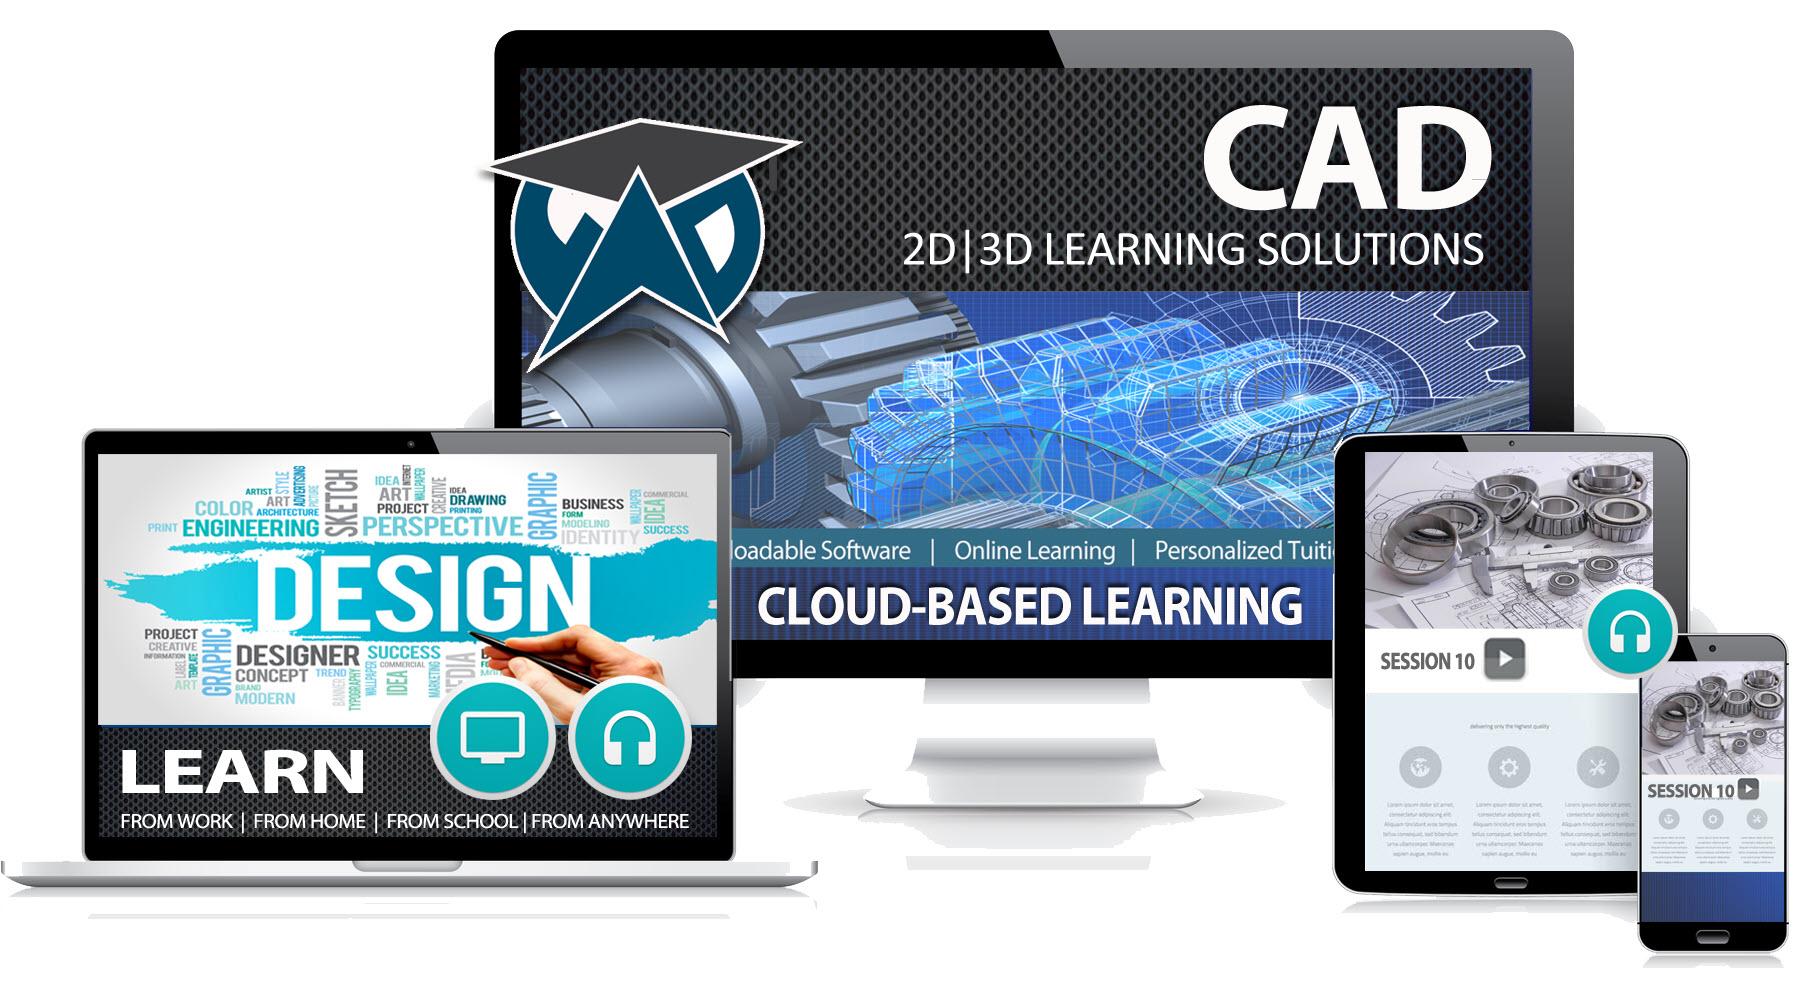 2021 CloudBasedLearning